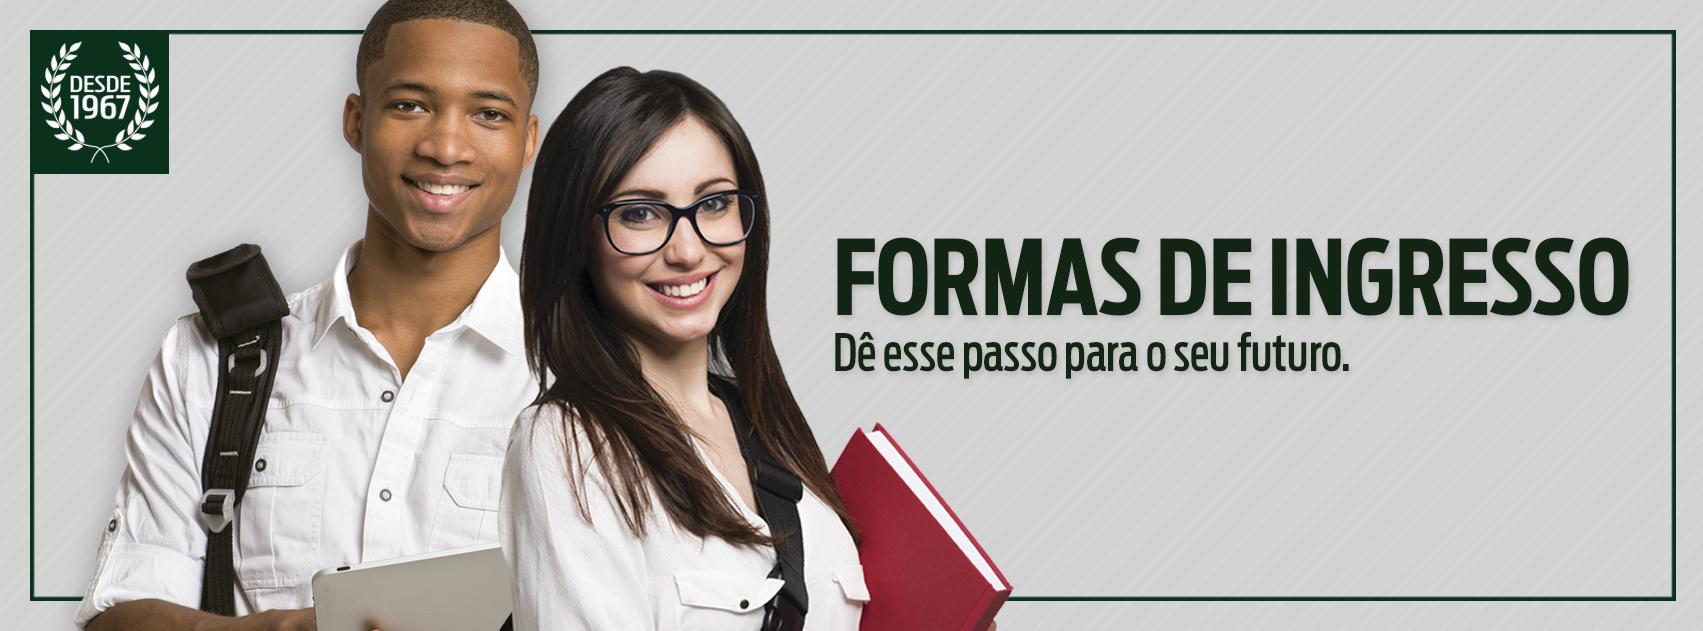 Imagem Formas de Ingresso